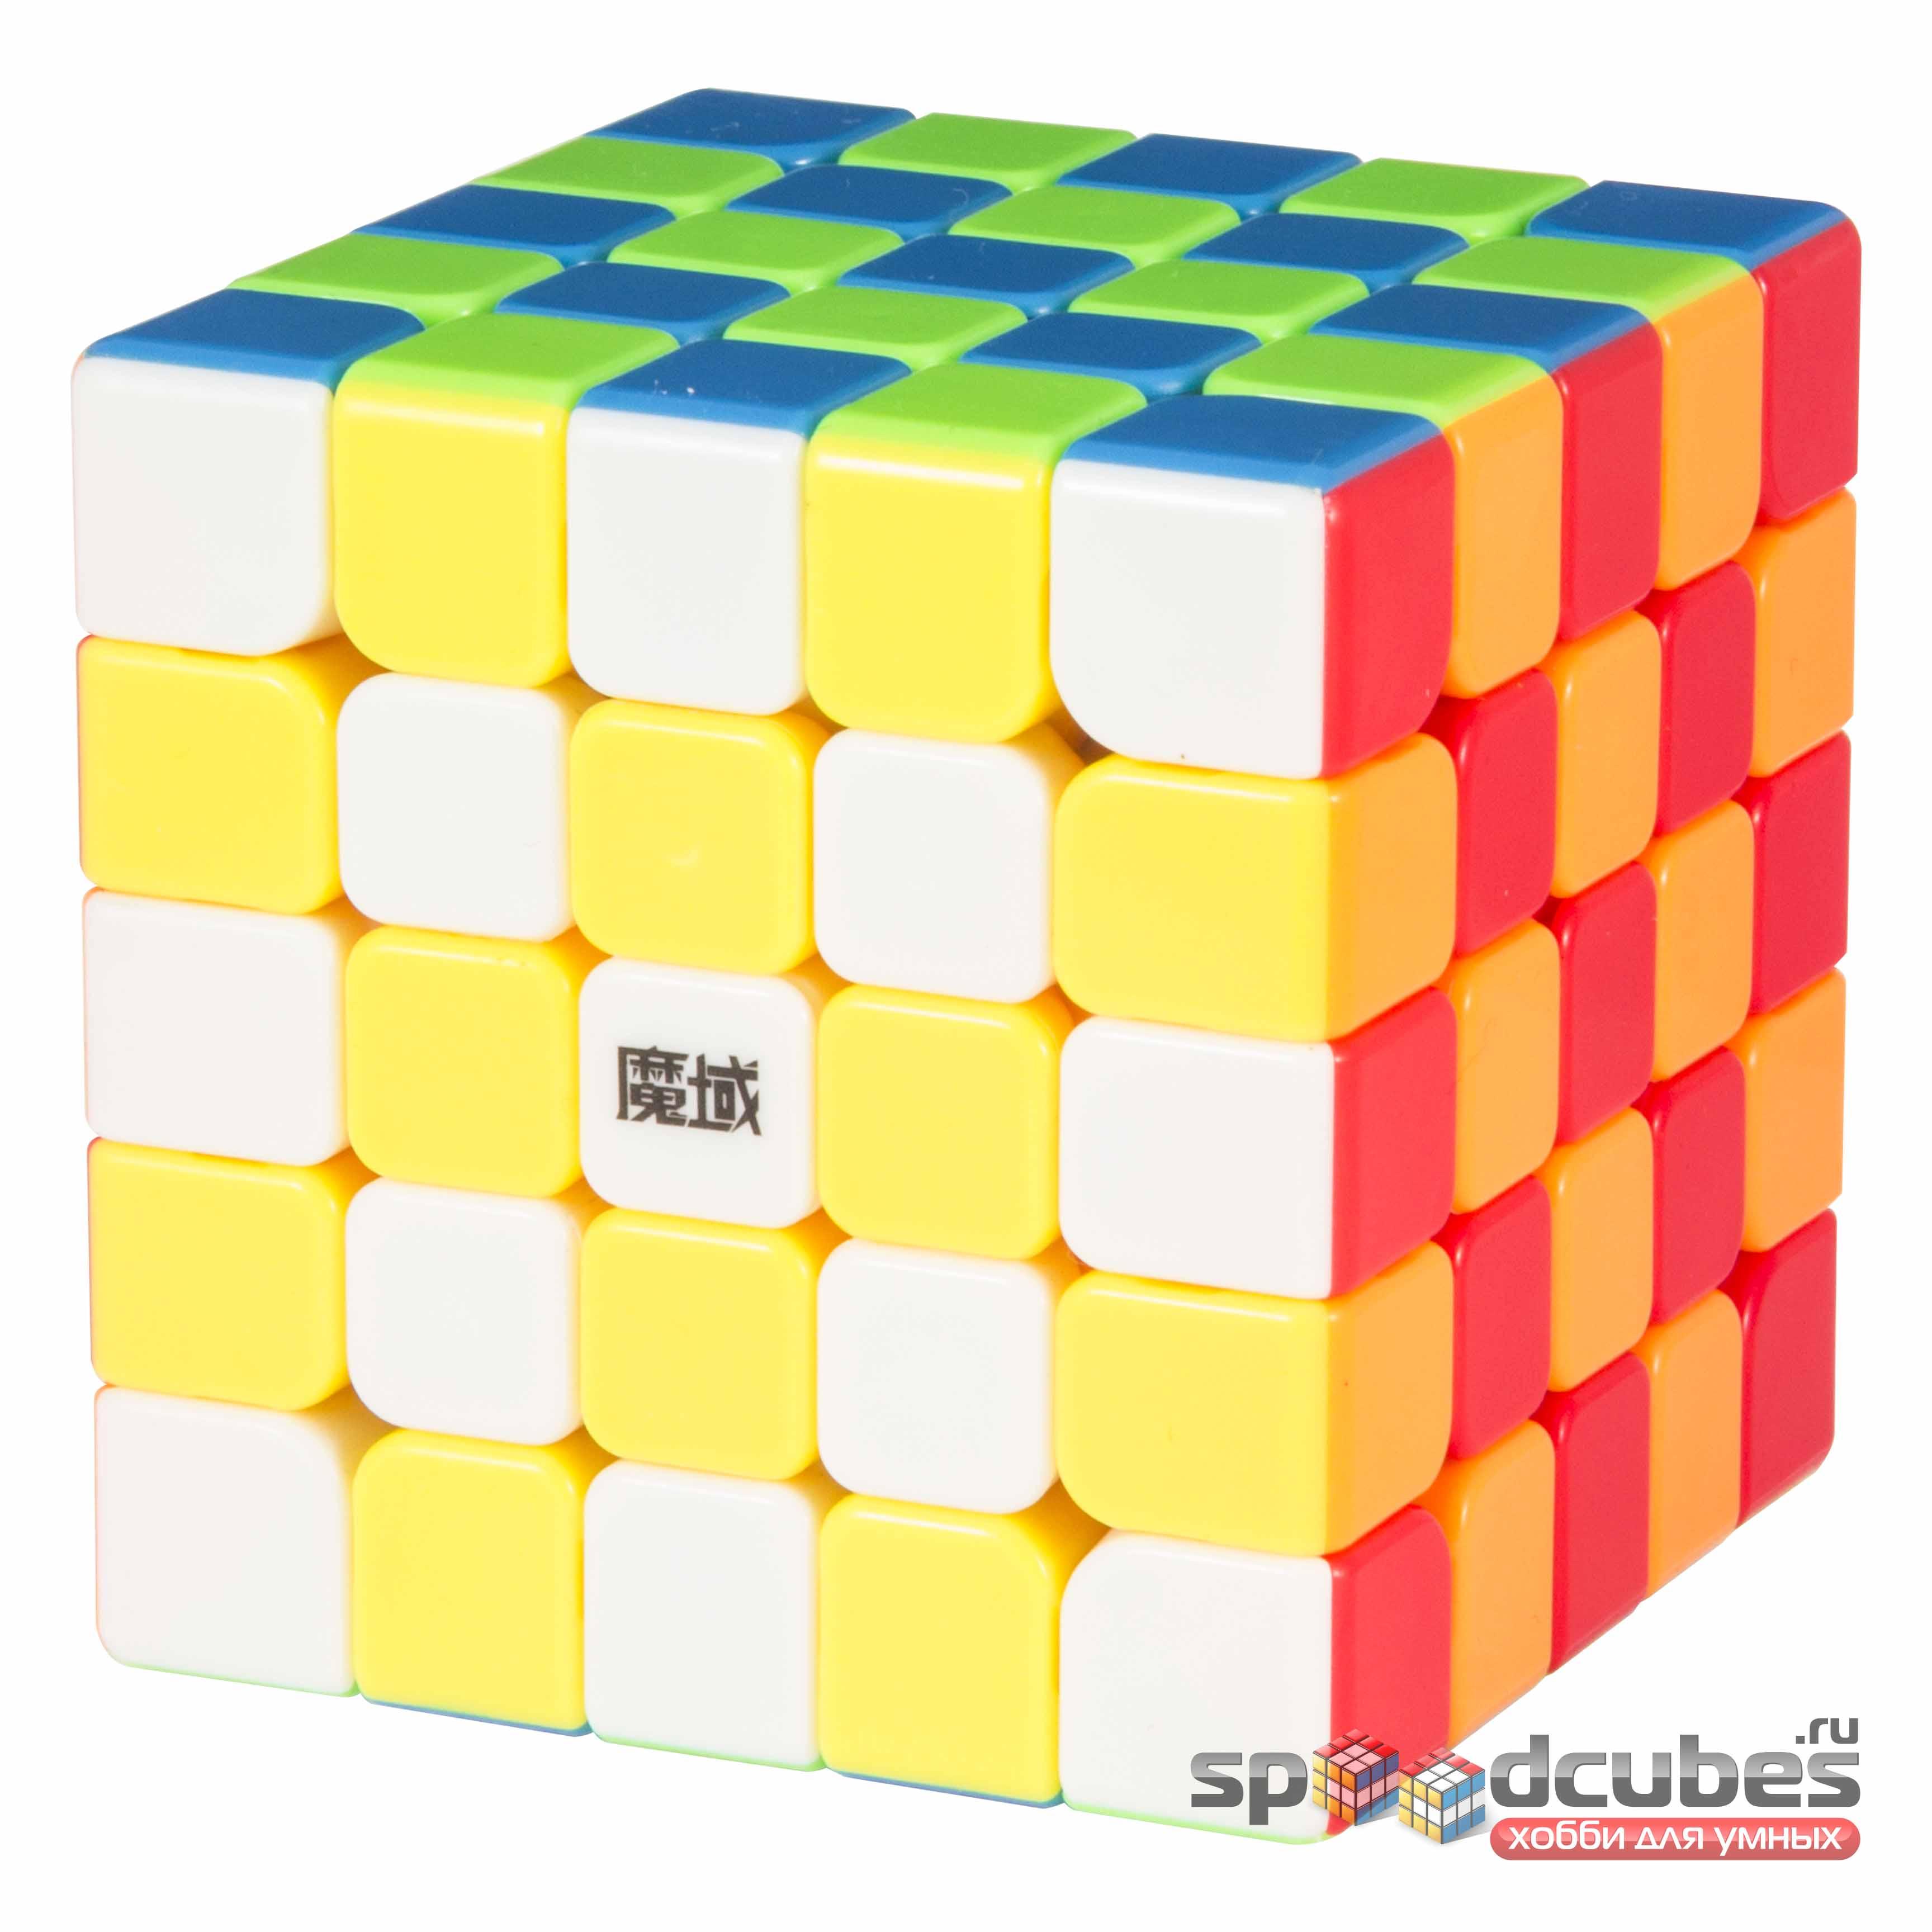 MoYu 5x5x5 Weichuang GTS Color 3